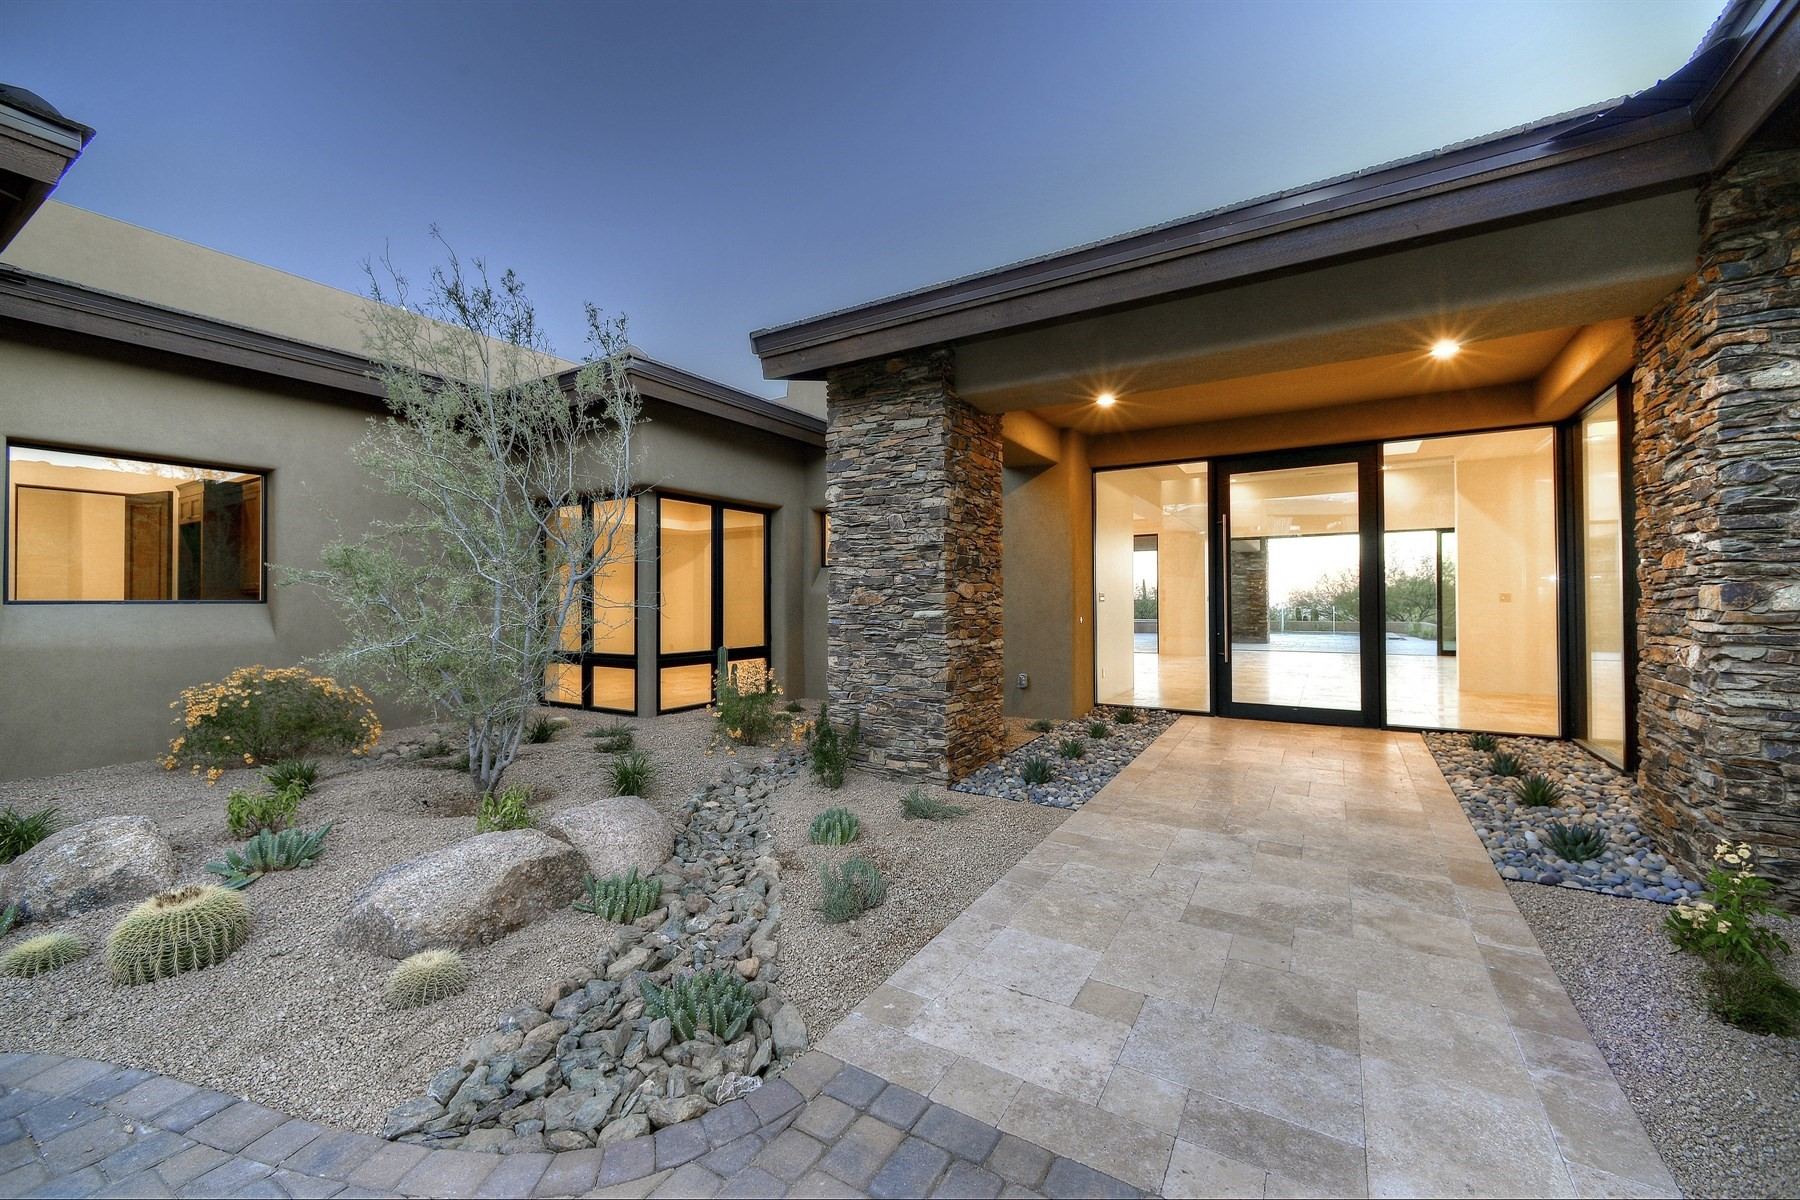 Villa per Vendita alle ore Southwest Contemporary with no interior steps and stone floors throughout 11077 E Honey Mesquite DR Scottsdale, Arizona, 85262 Stati Uniti